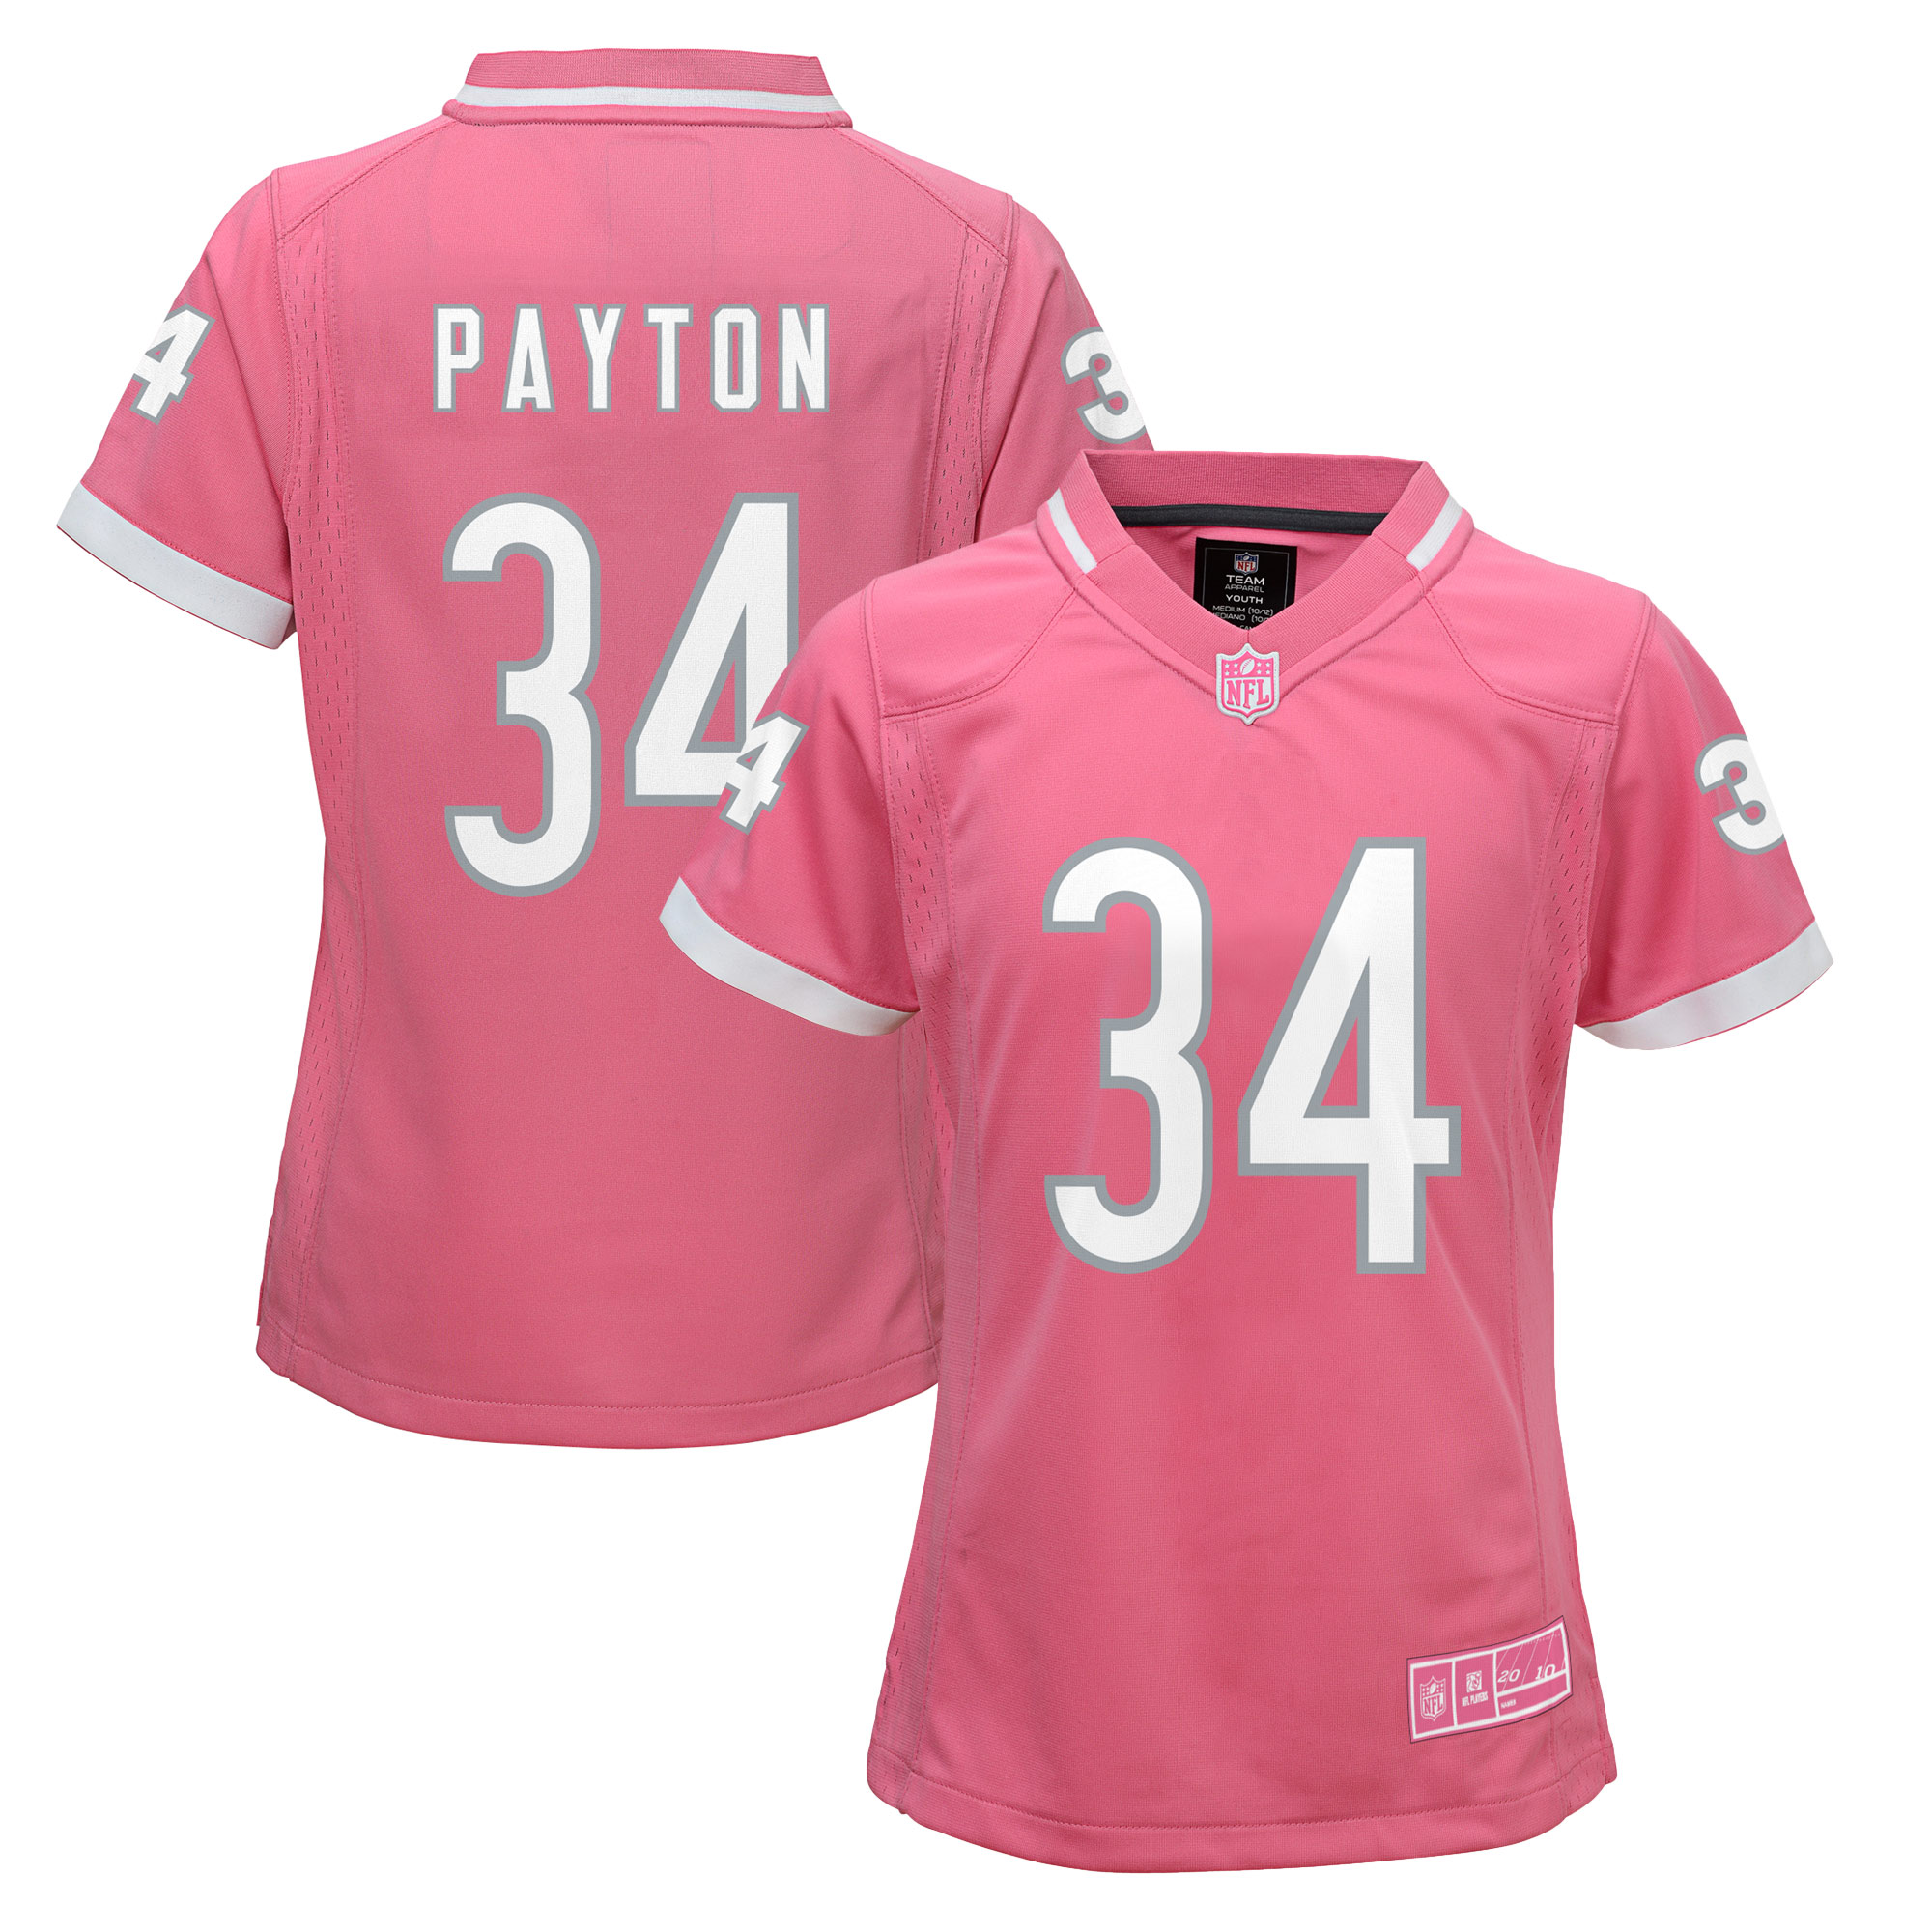 Walter Payton Chicago Bears Girls Youth Fashion Bubble Gum Jersey - Pink